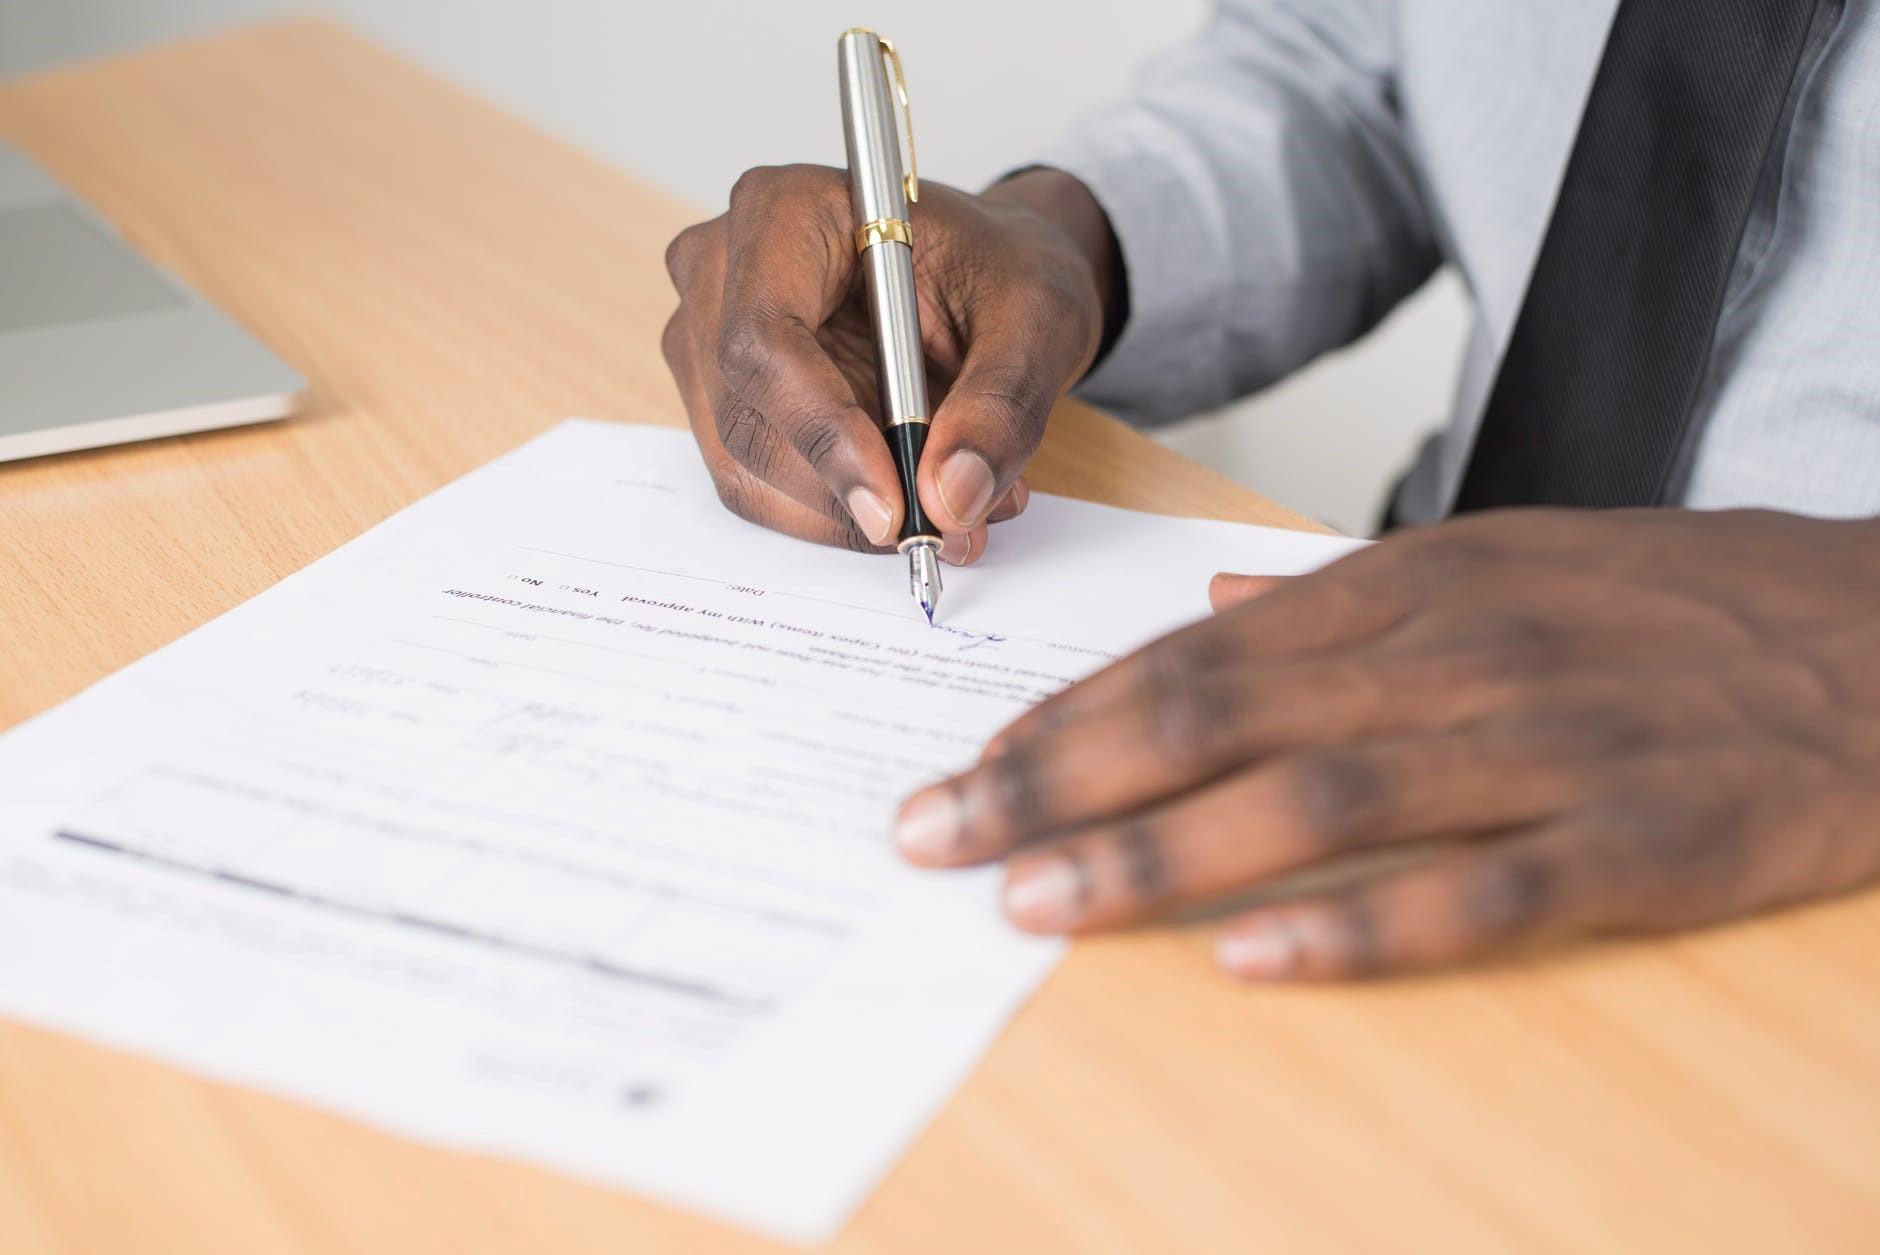 Person filing broker mortgage application.